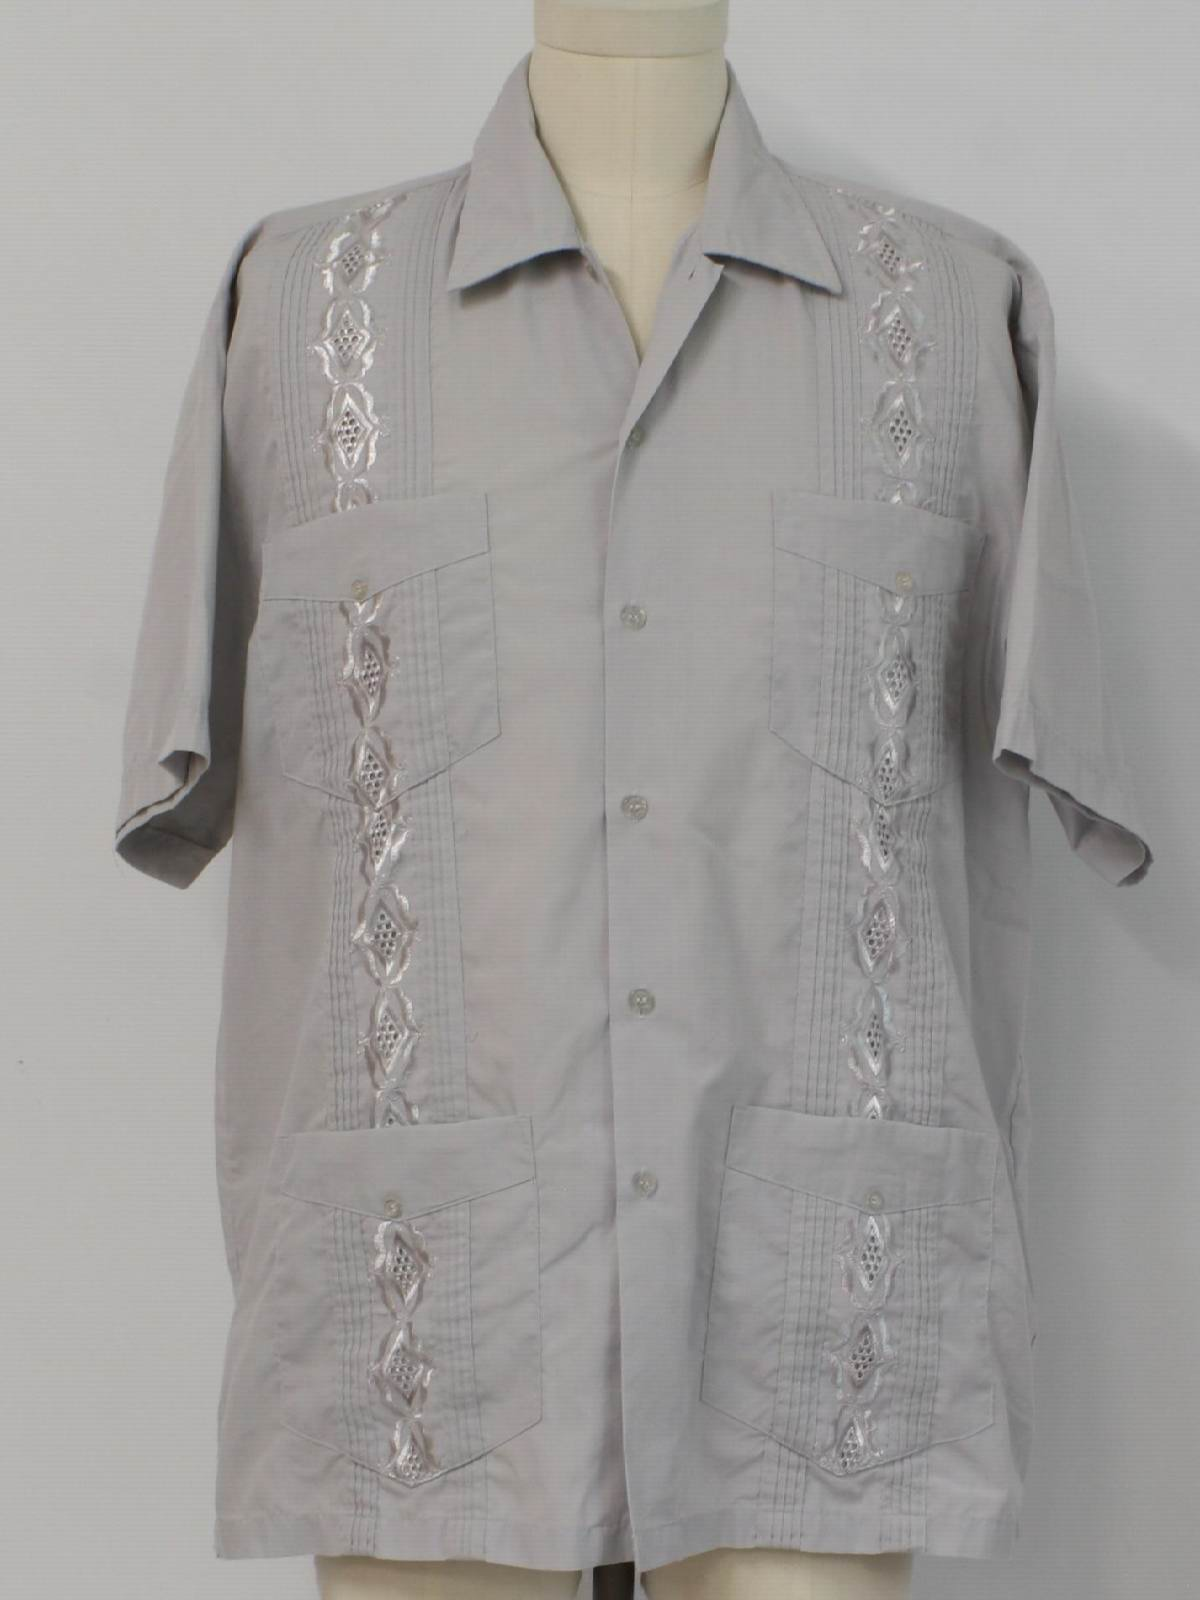 ba180a5f6a 80s guayabera shirt chic elegant 80s chic elegant mens light grey cotton  polyester short sleeve guayabera